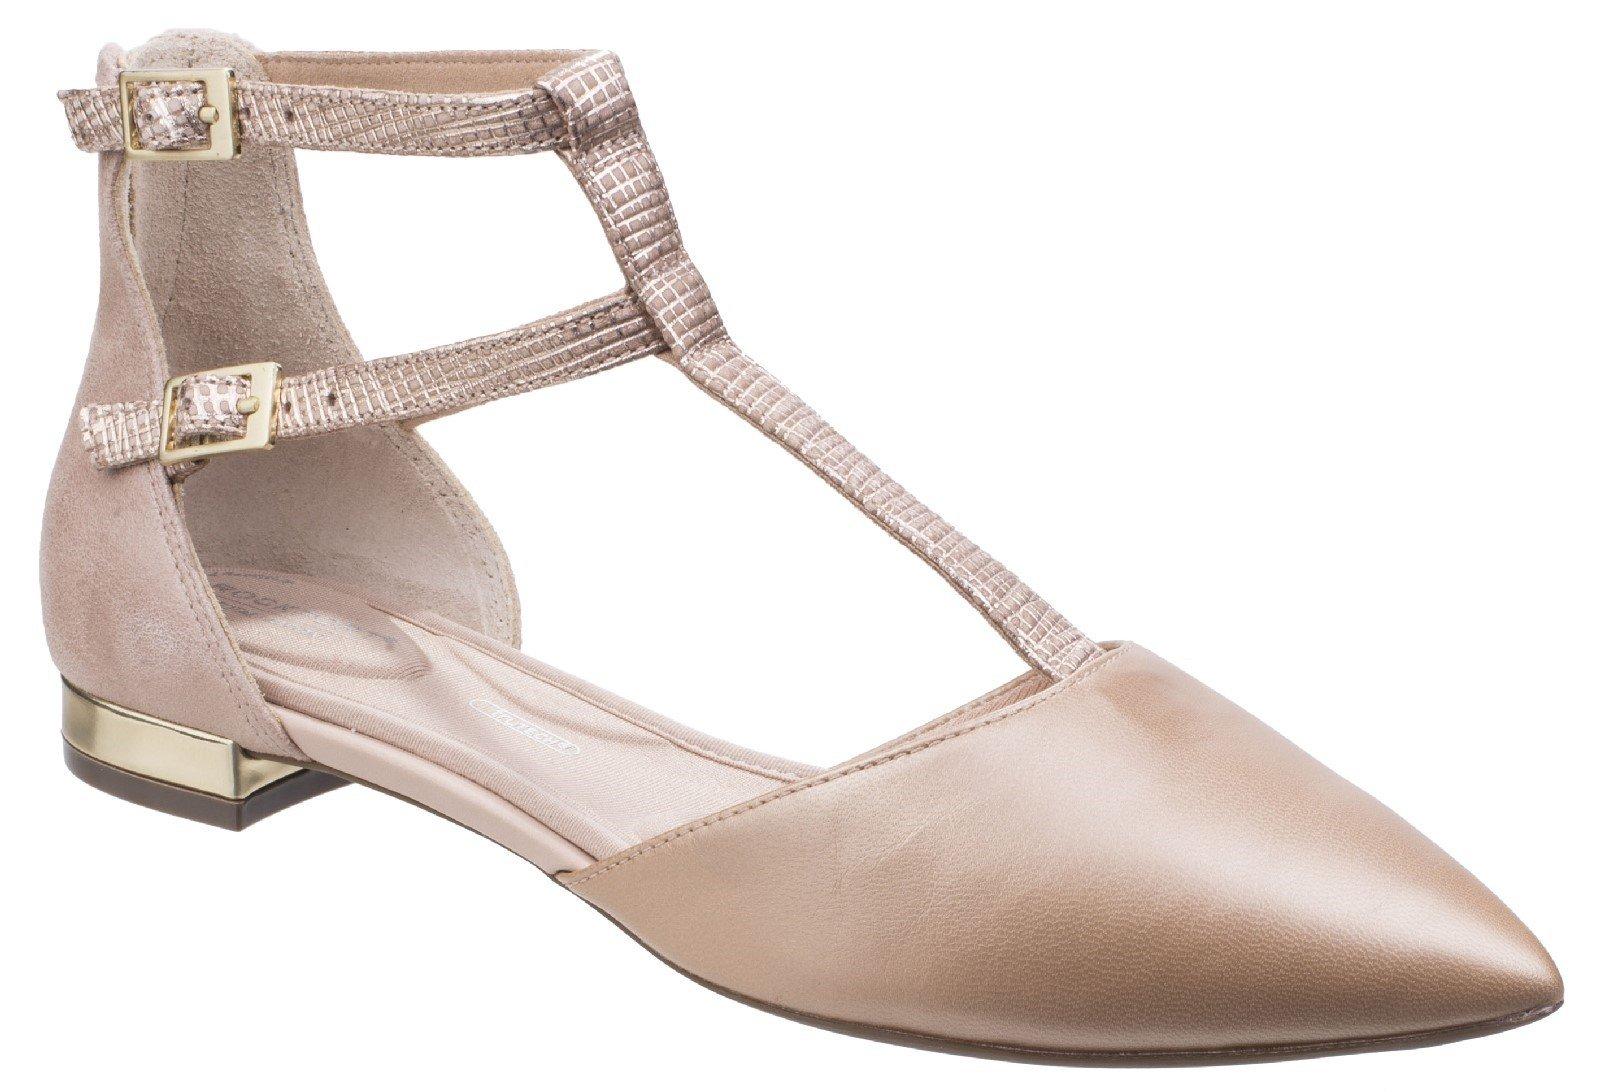 Rockport Women's Adelyn T Strap Heel Shoe Various Colours 26798 - Blush 4